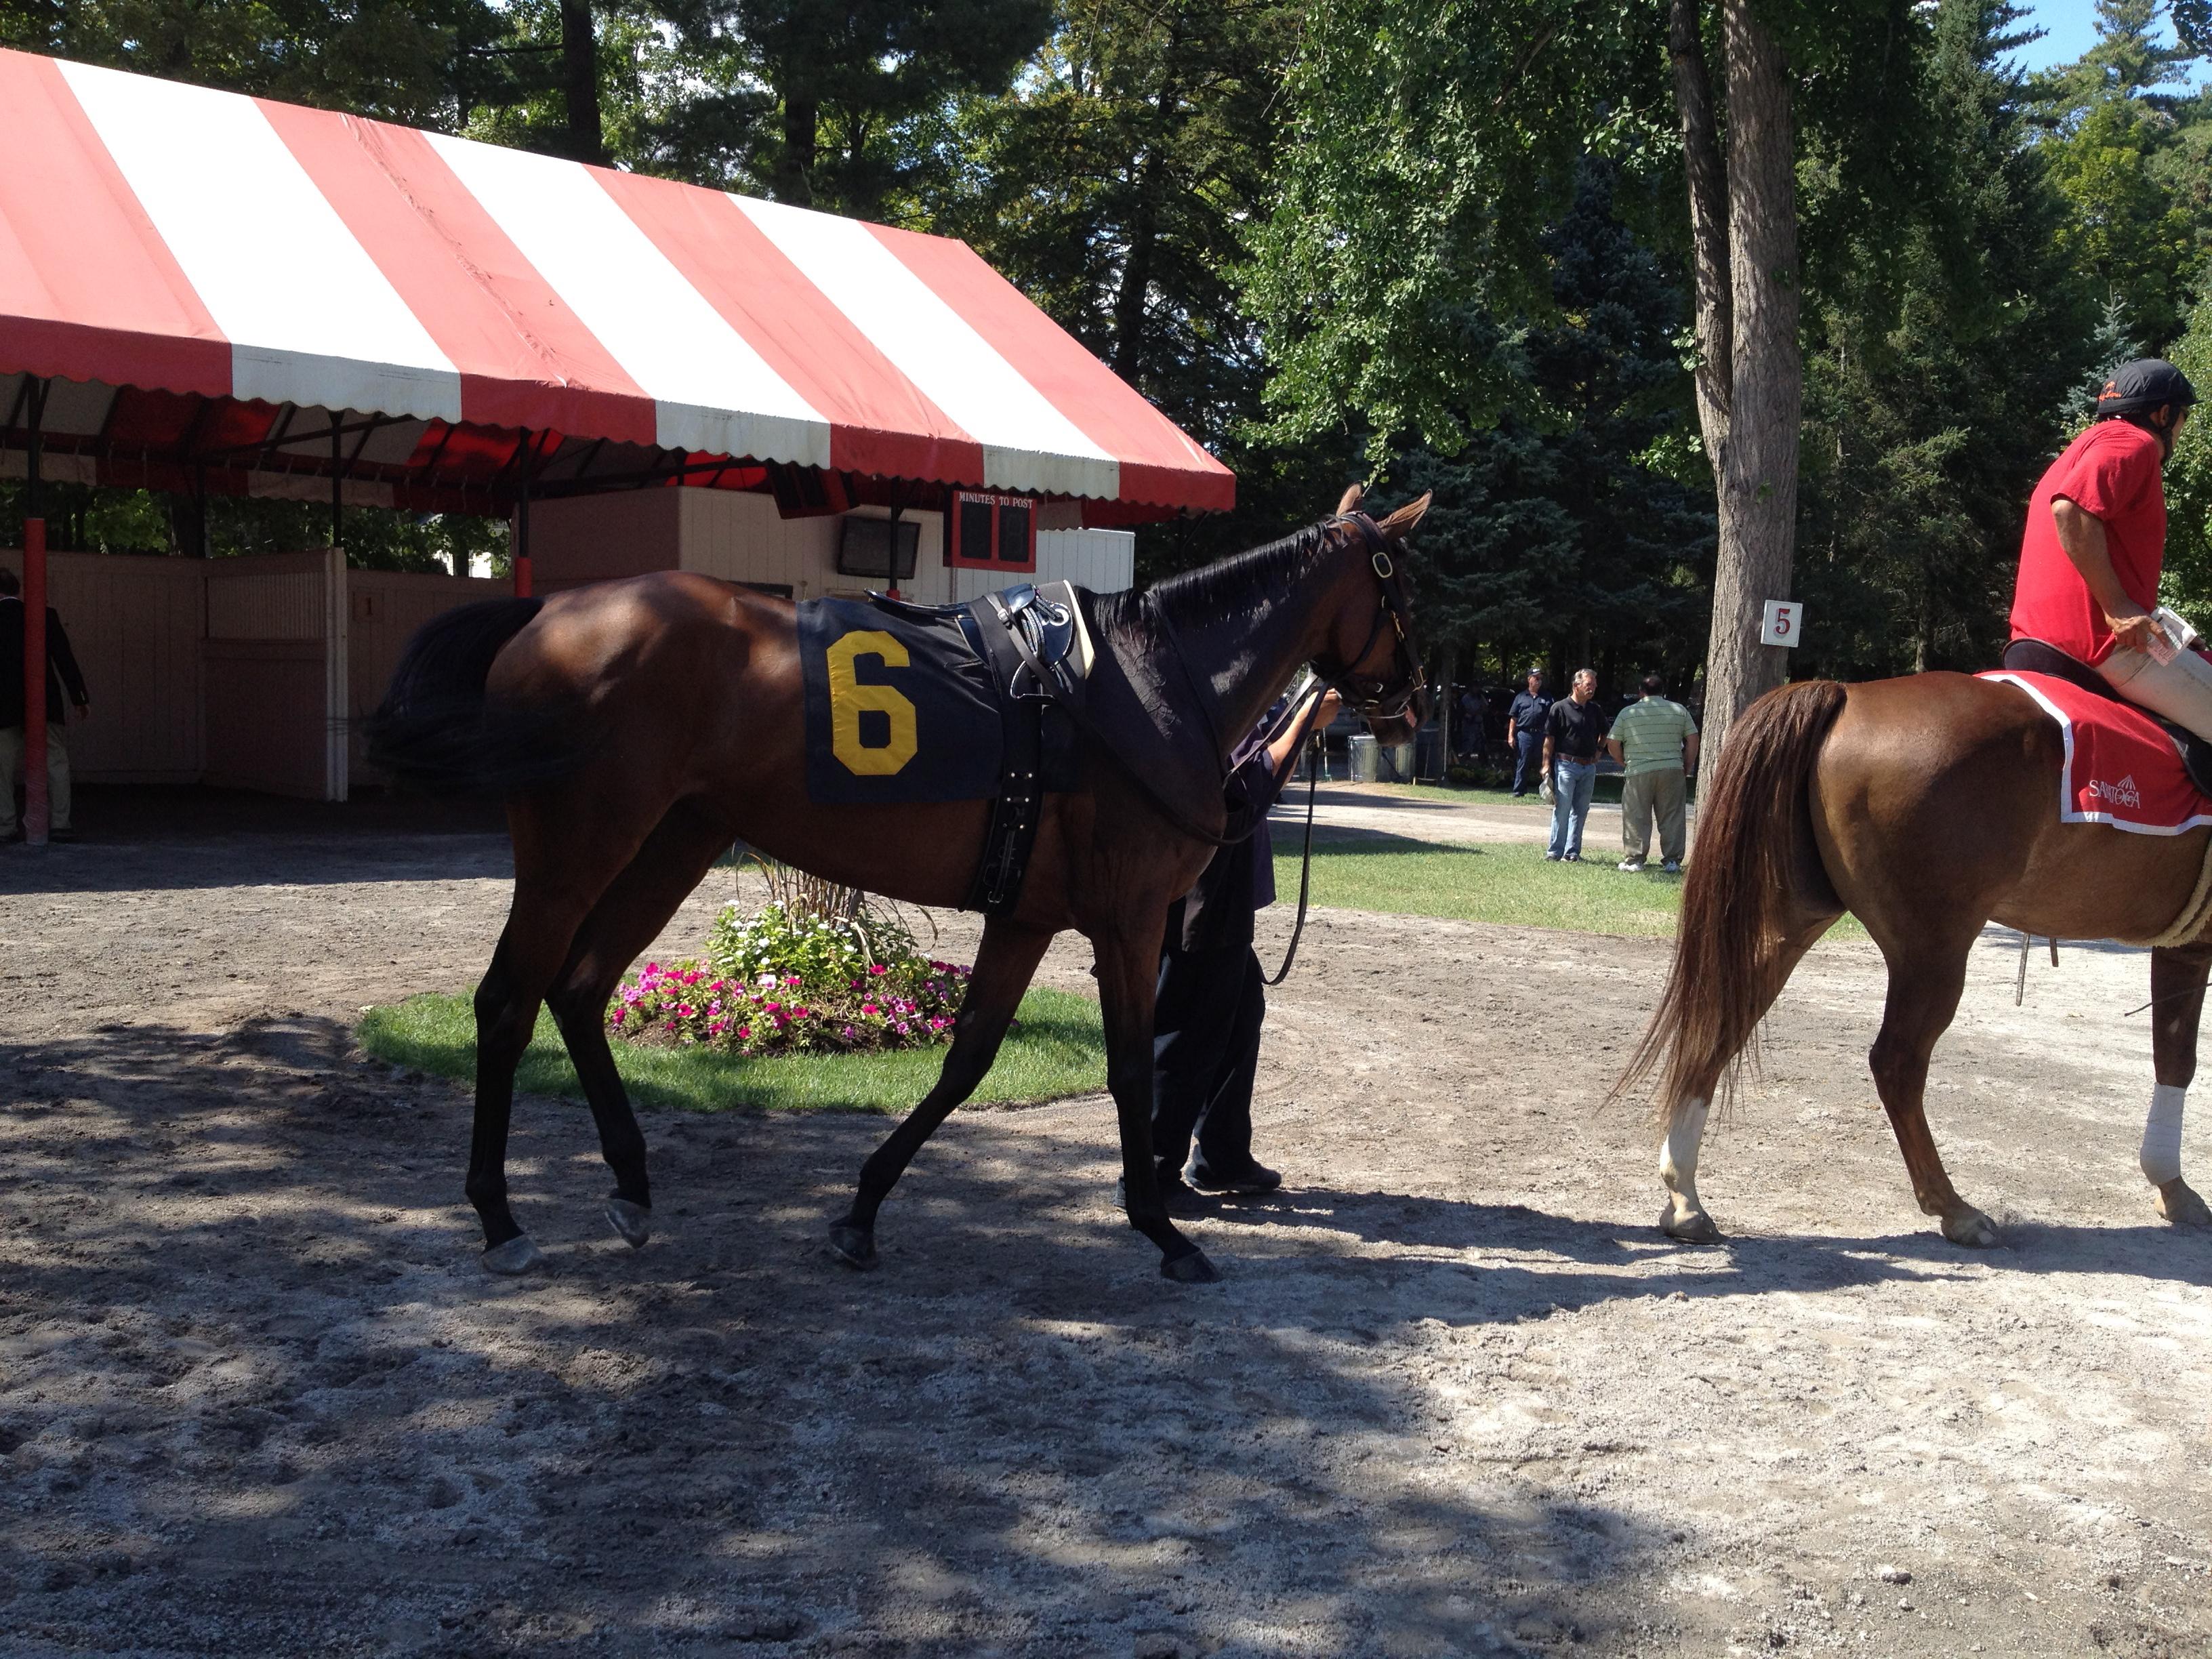 Inside the Paddock at Saratoga Racetrack